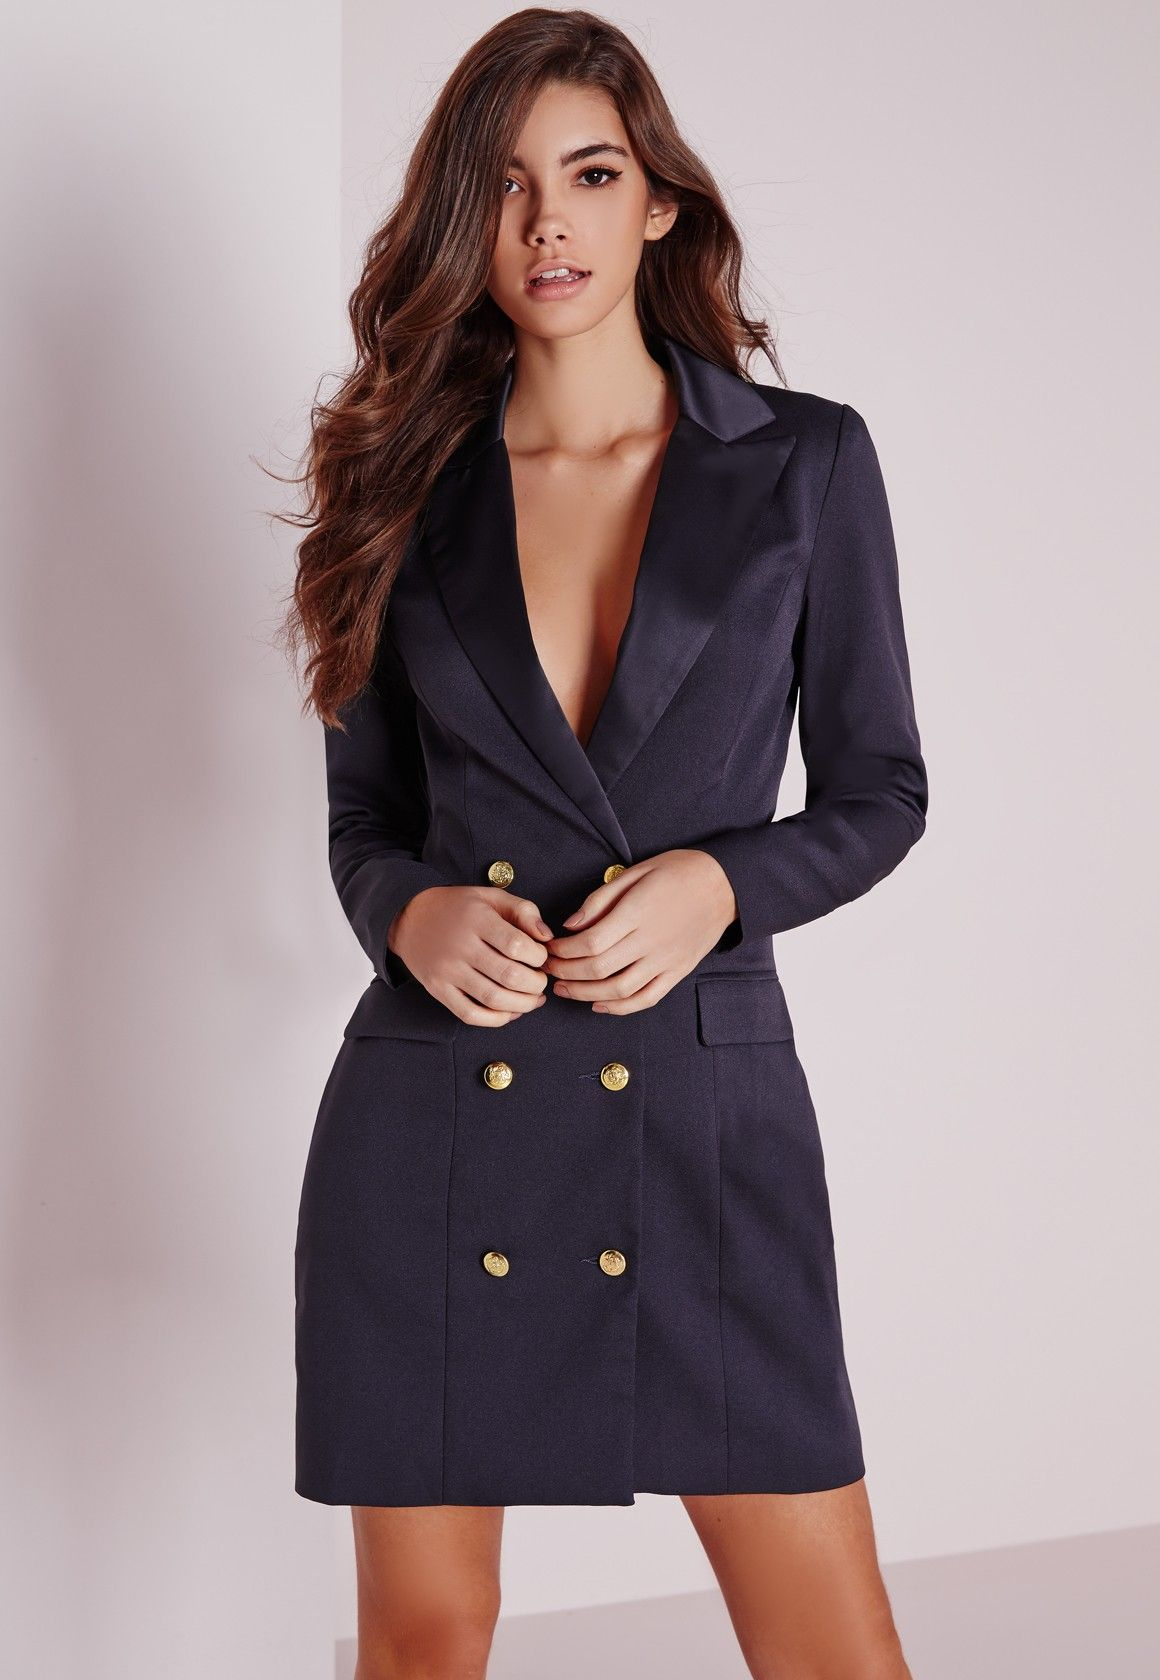 Veste femme pour robe bleu marine